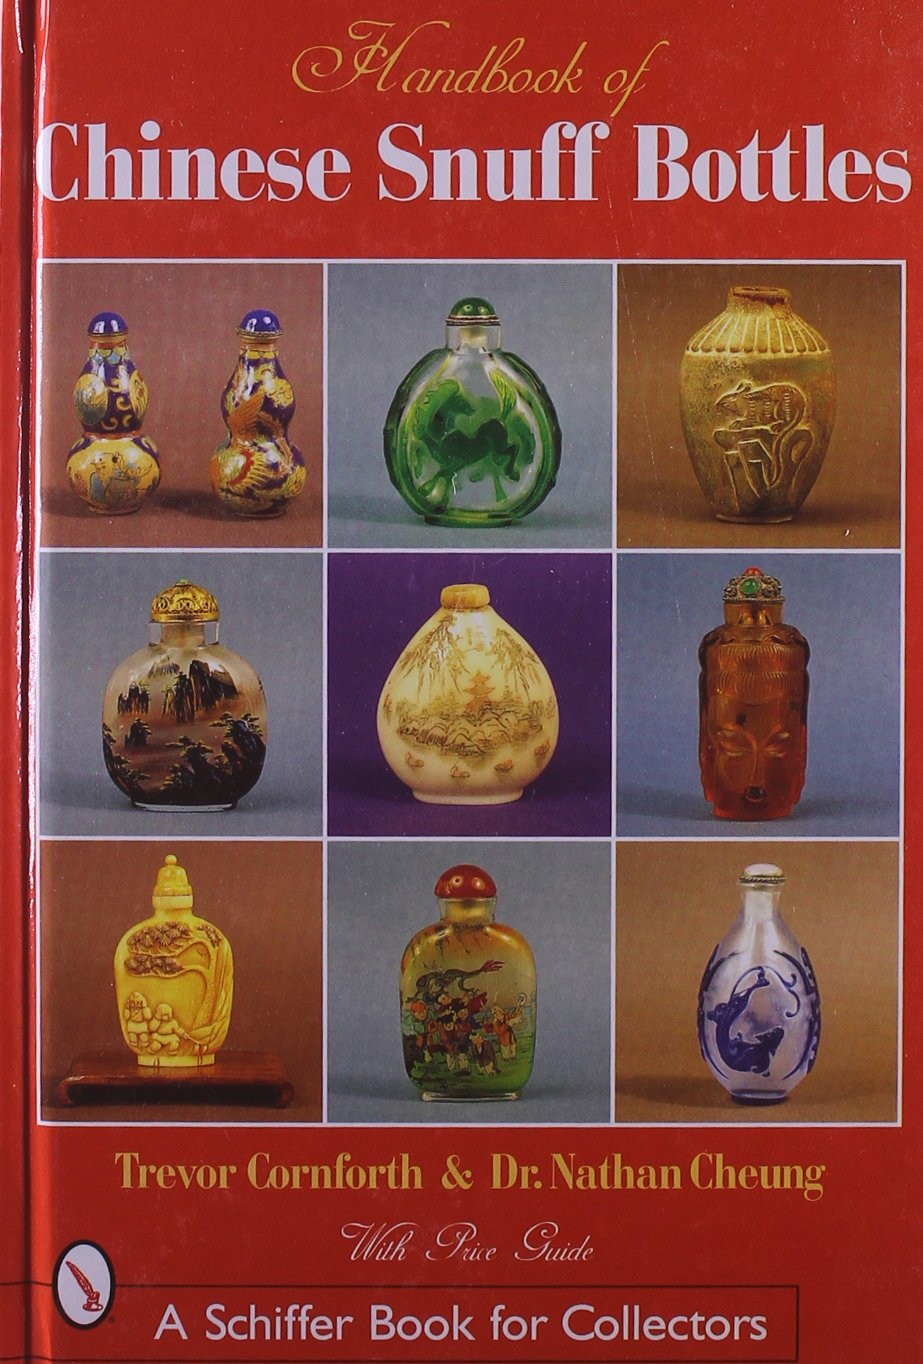 The Handbook of Chinese Snuff Bottles